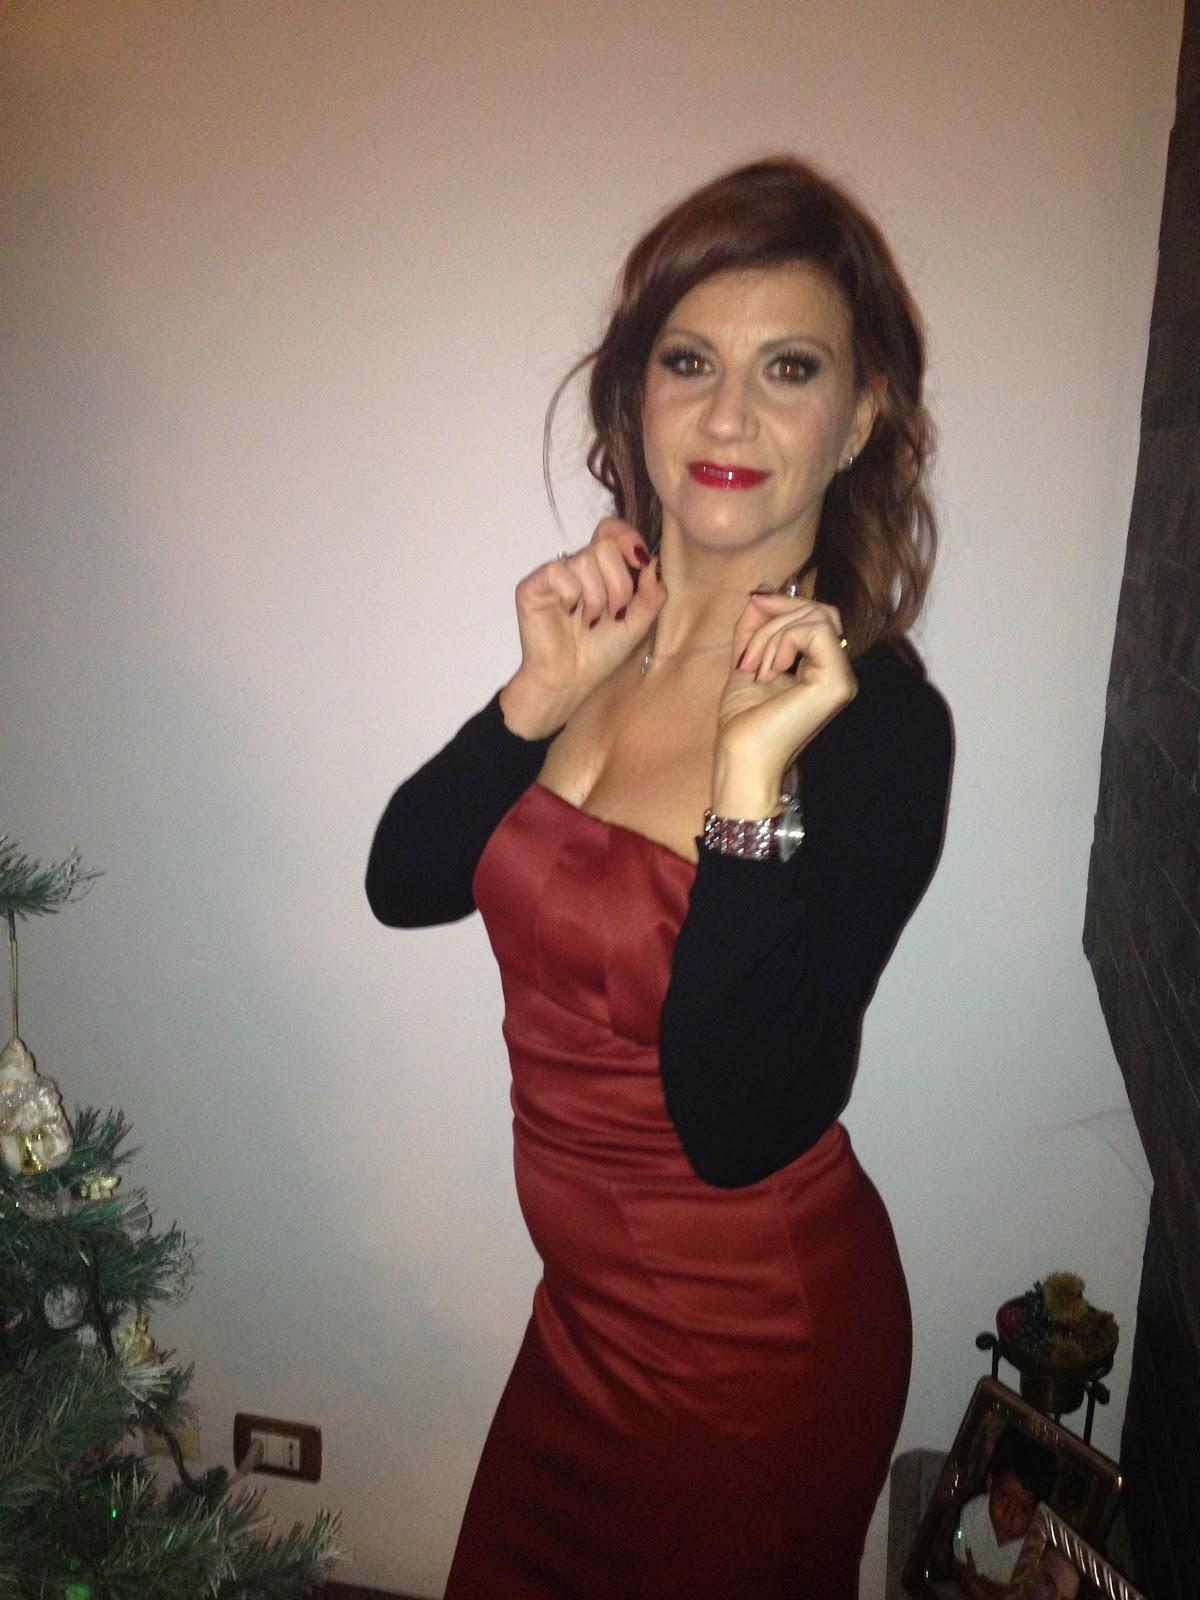 Fashion makeup gennaio 2013 for Patrizia rossetti marito